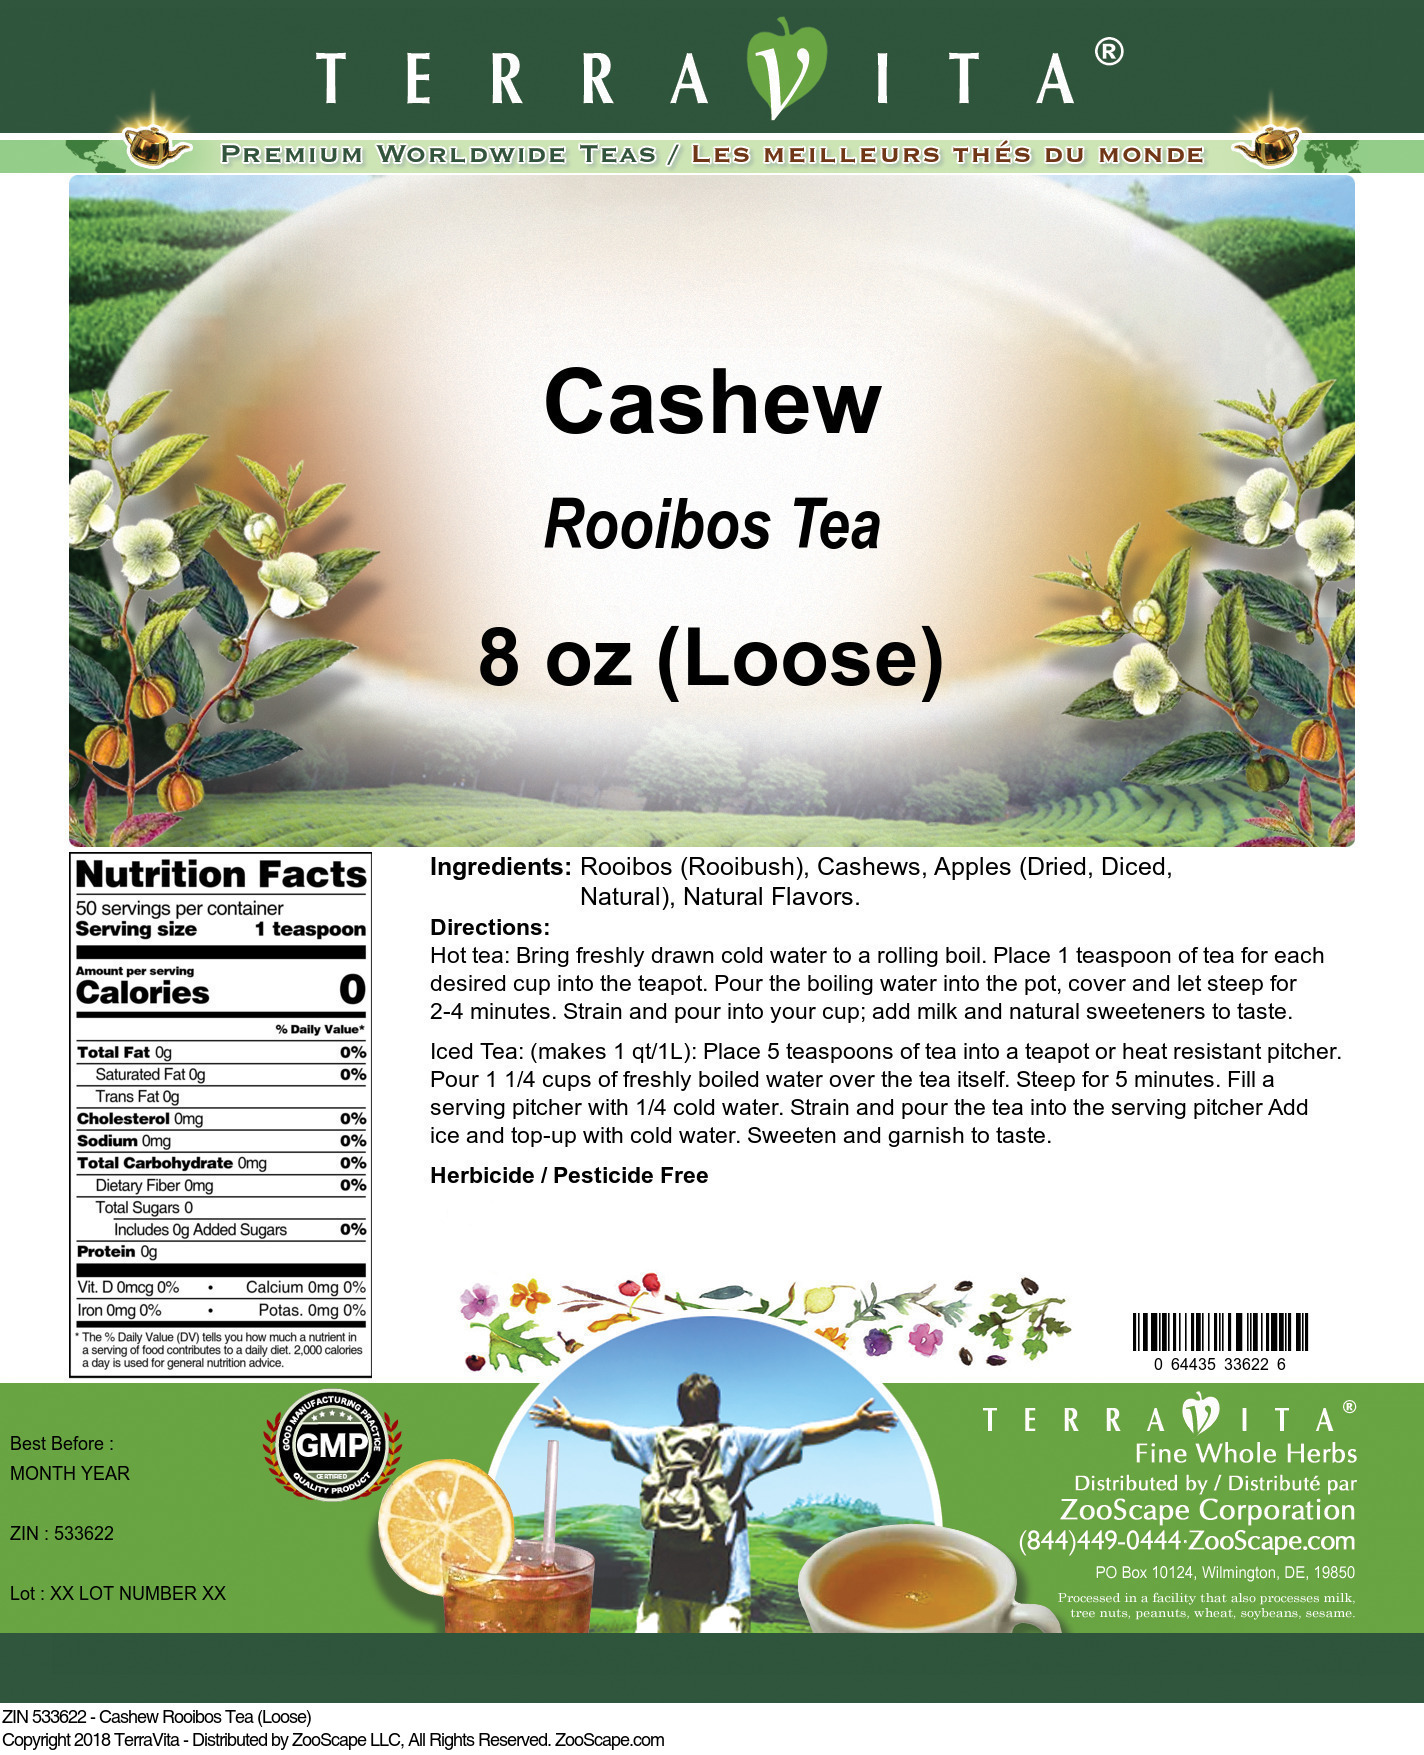 Cashew Rooibos Tea (Loose)